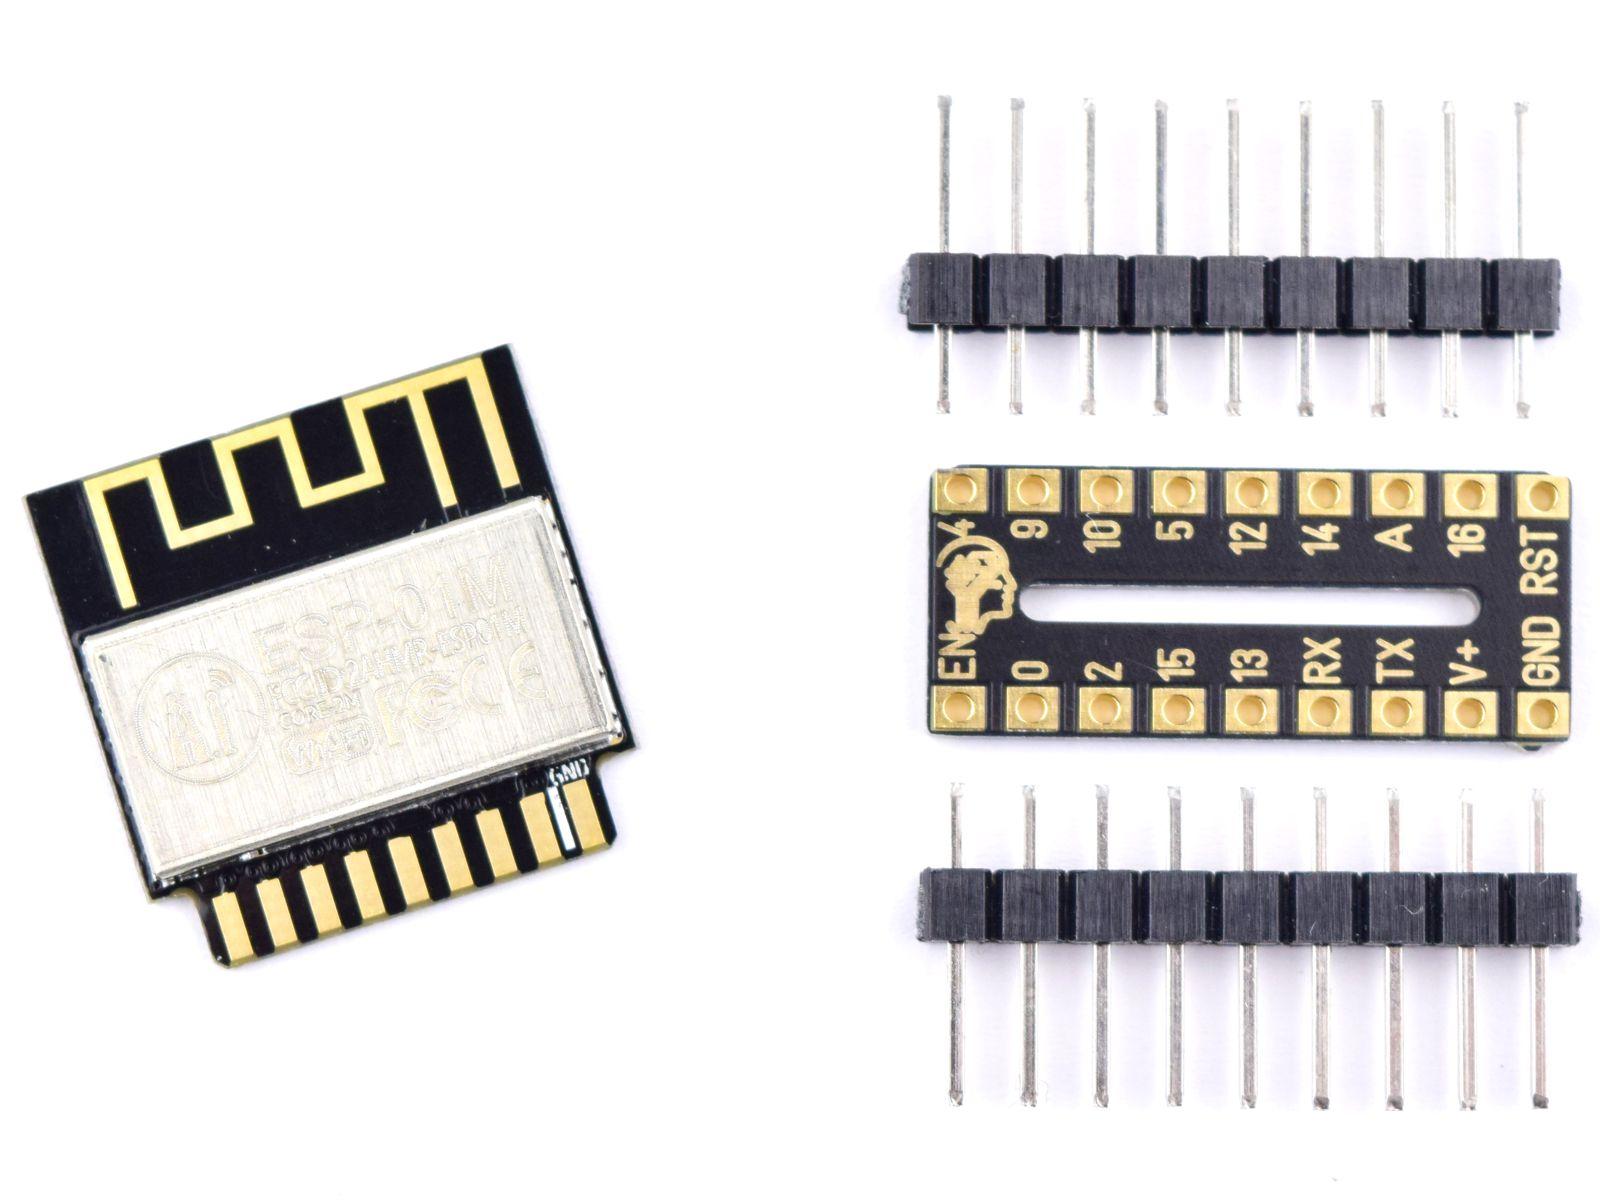 Ai-Thinker ESP-01M ESP8285 with DIP-18 Adapter – Smallest Breadboard Wi-Fi IoT Module